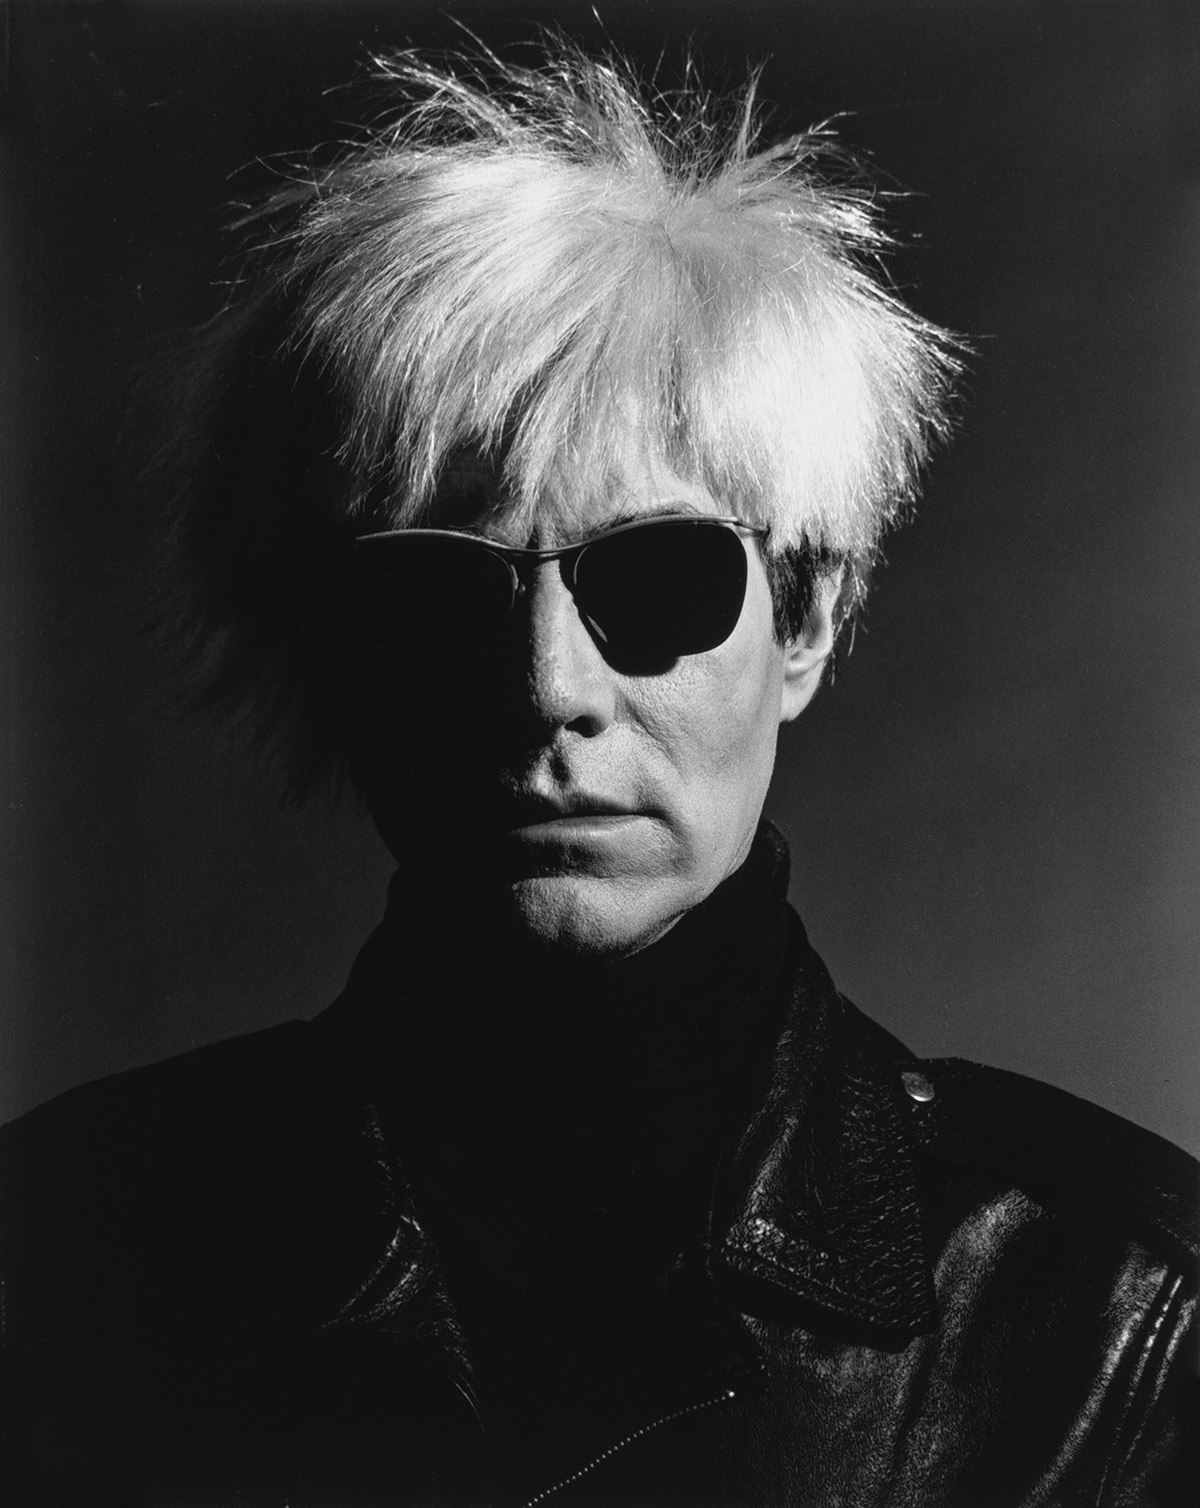 GREG-GORMAN-(1949--)-Andy-Warhol-Los-Angeles